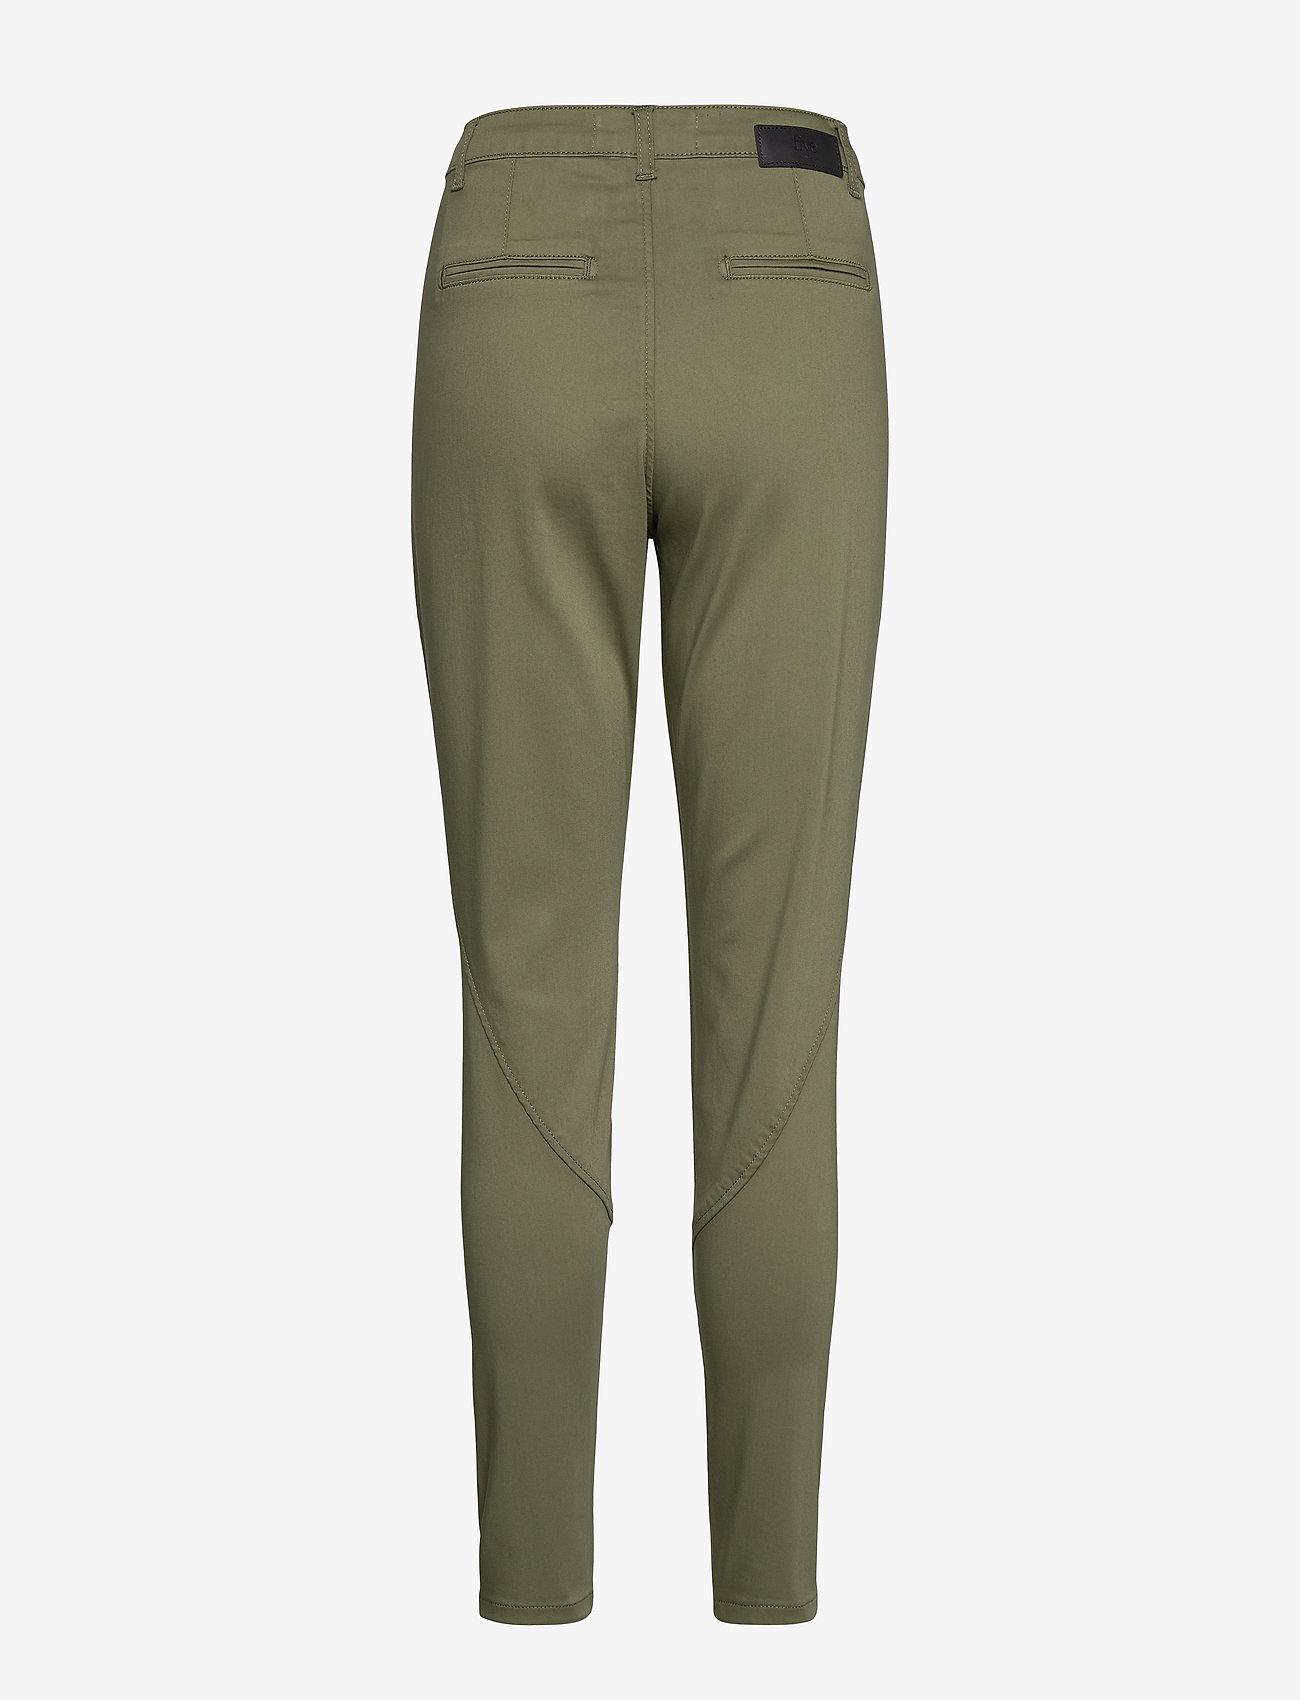 FIVEUNITS - Jolie 606 - broeken med skinny fit - lichen green - 1